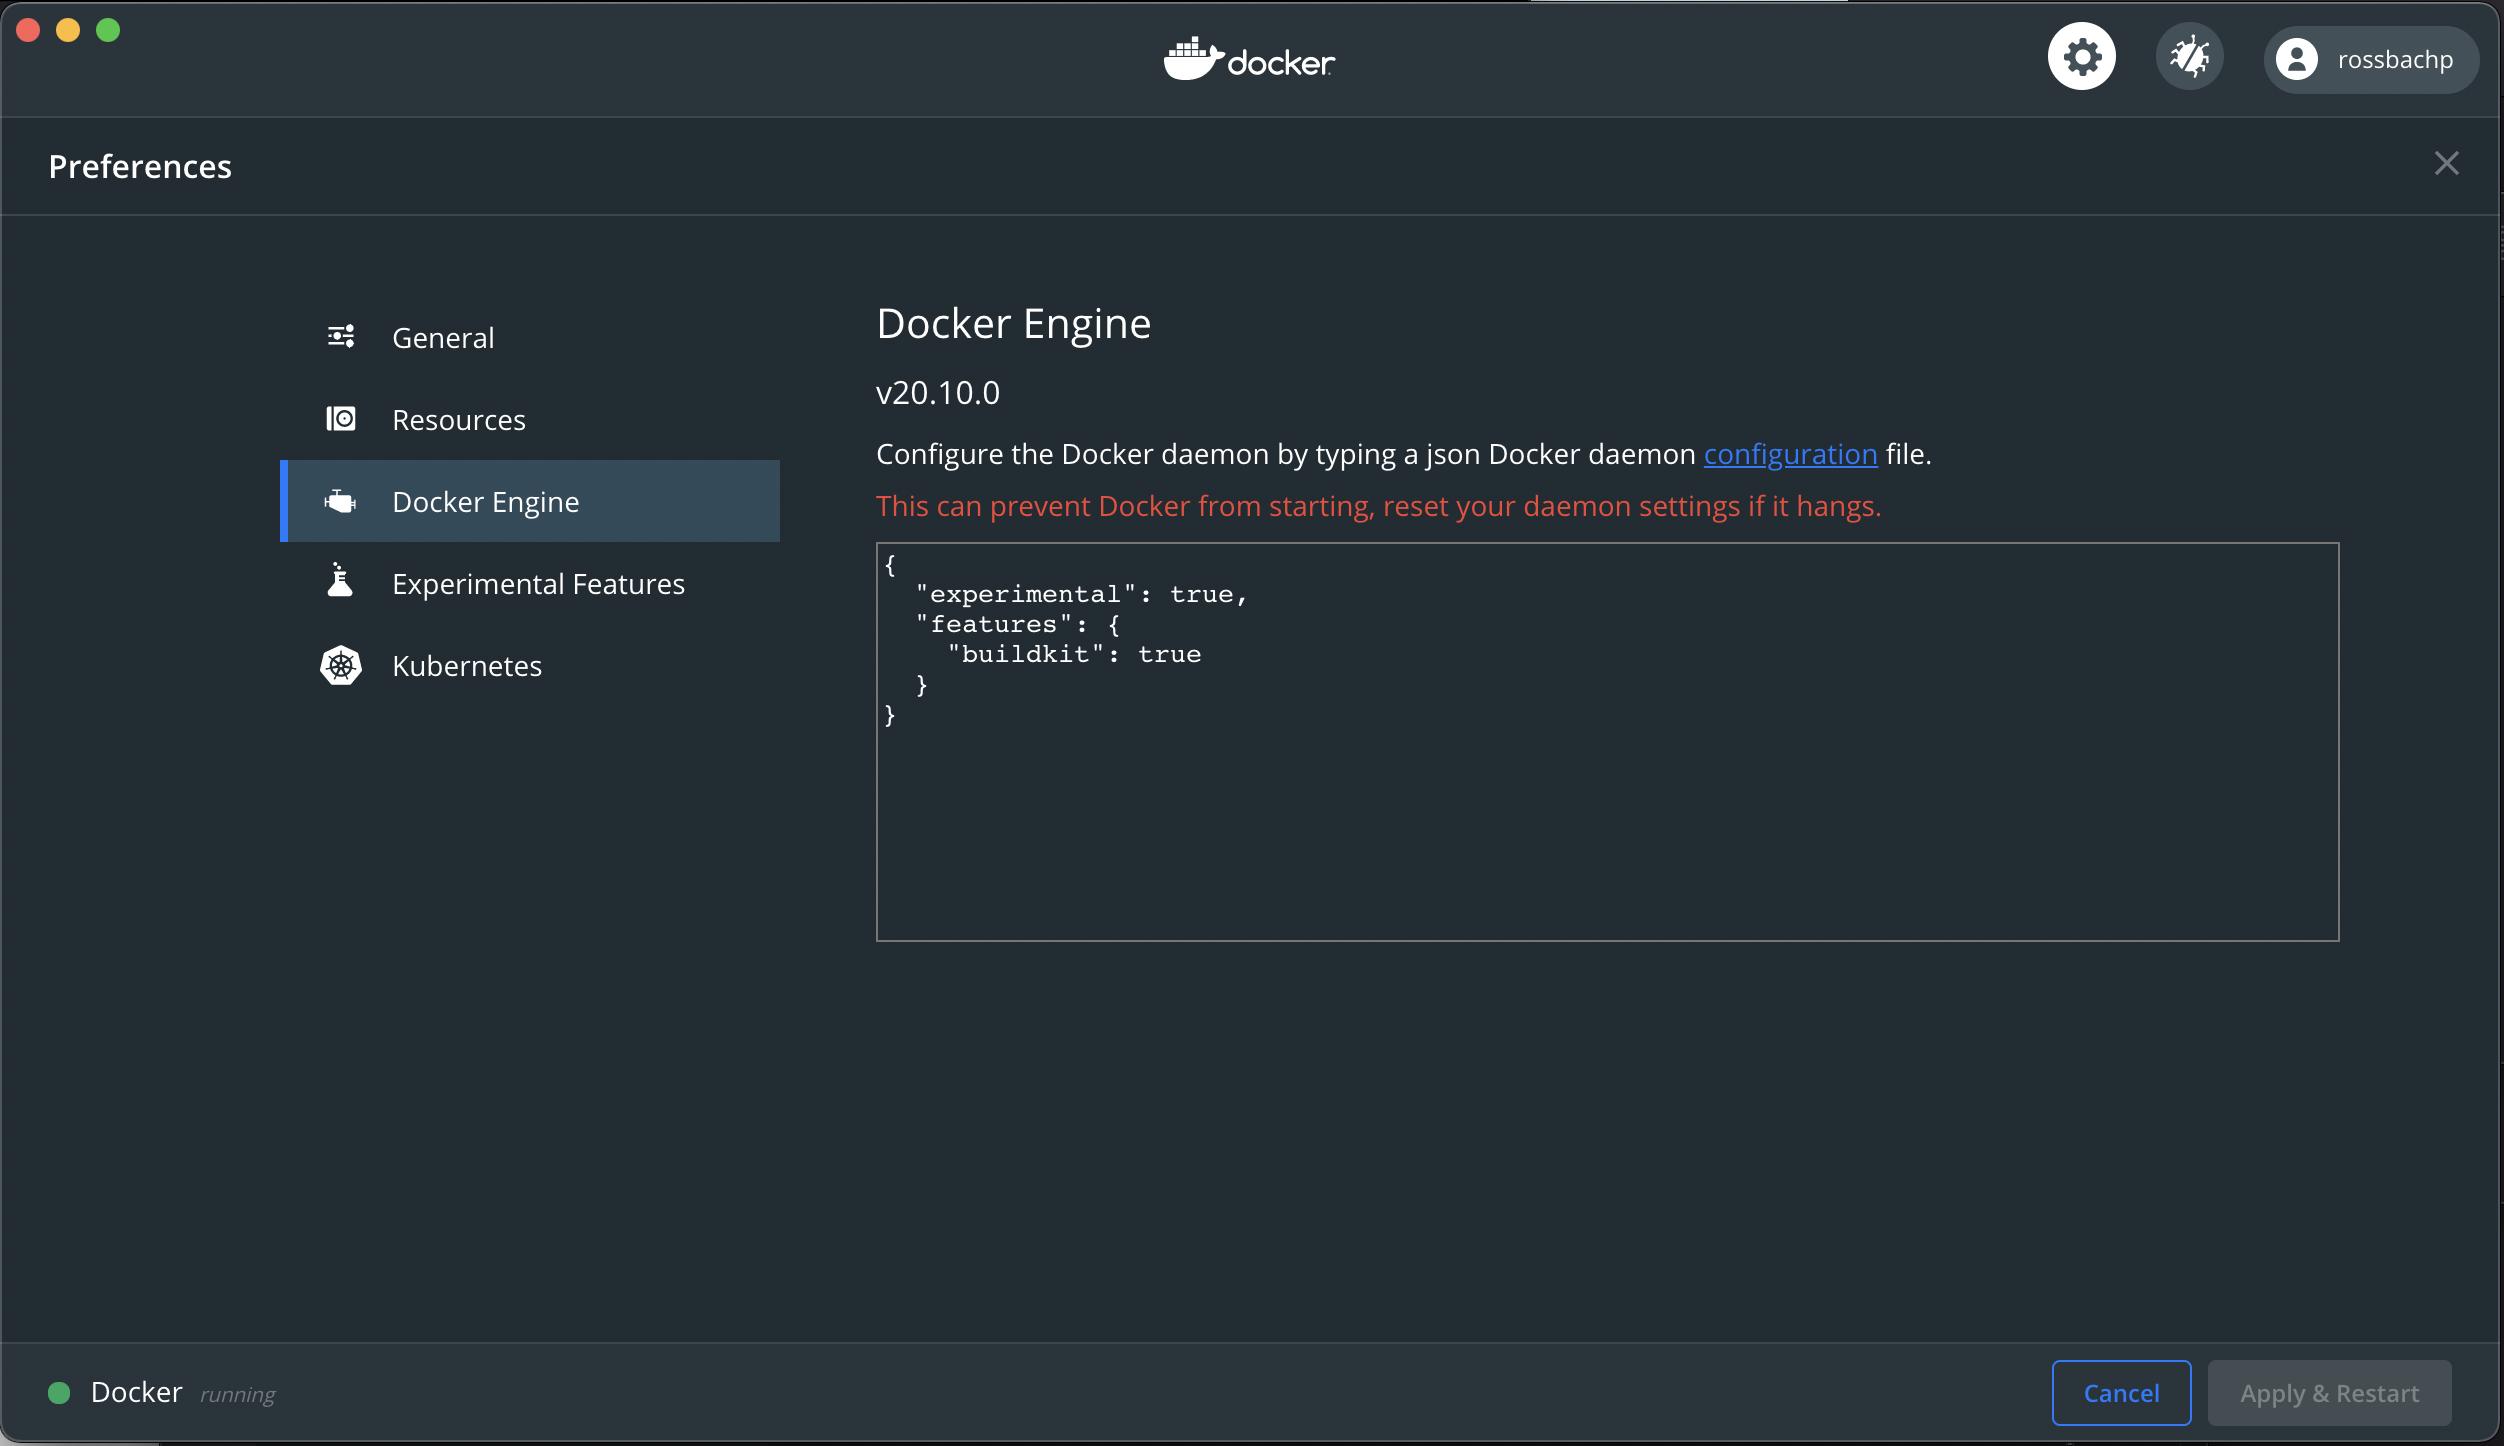 Docker for Desktop Preference